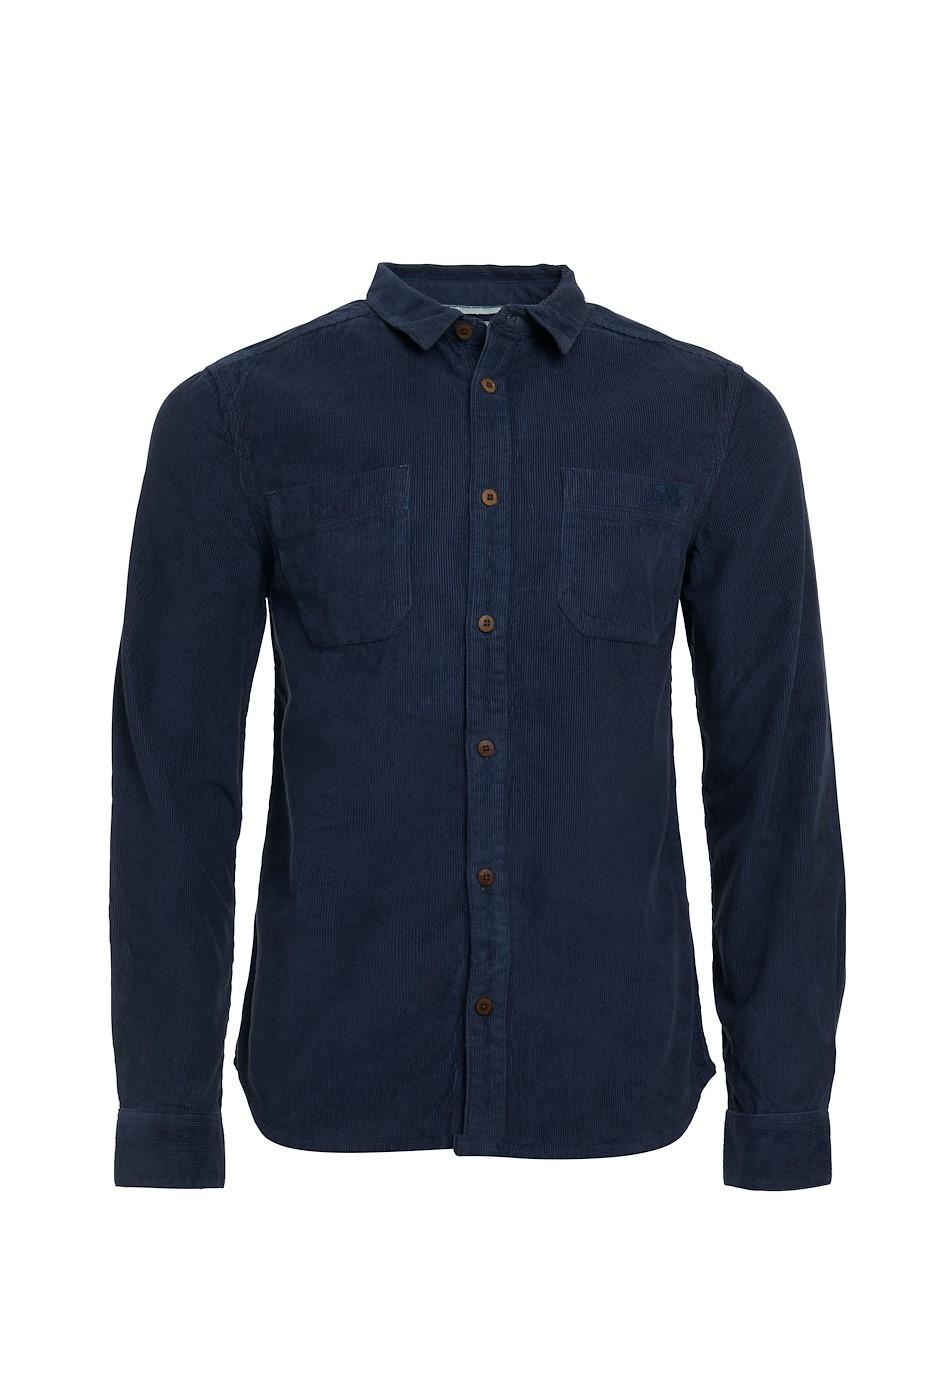 Leonard Long Sleeve Cord Shirt Navy